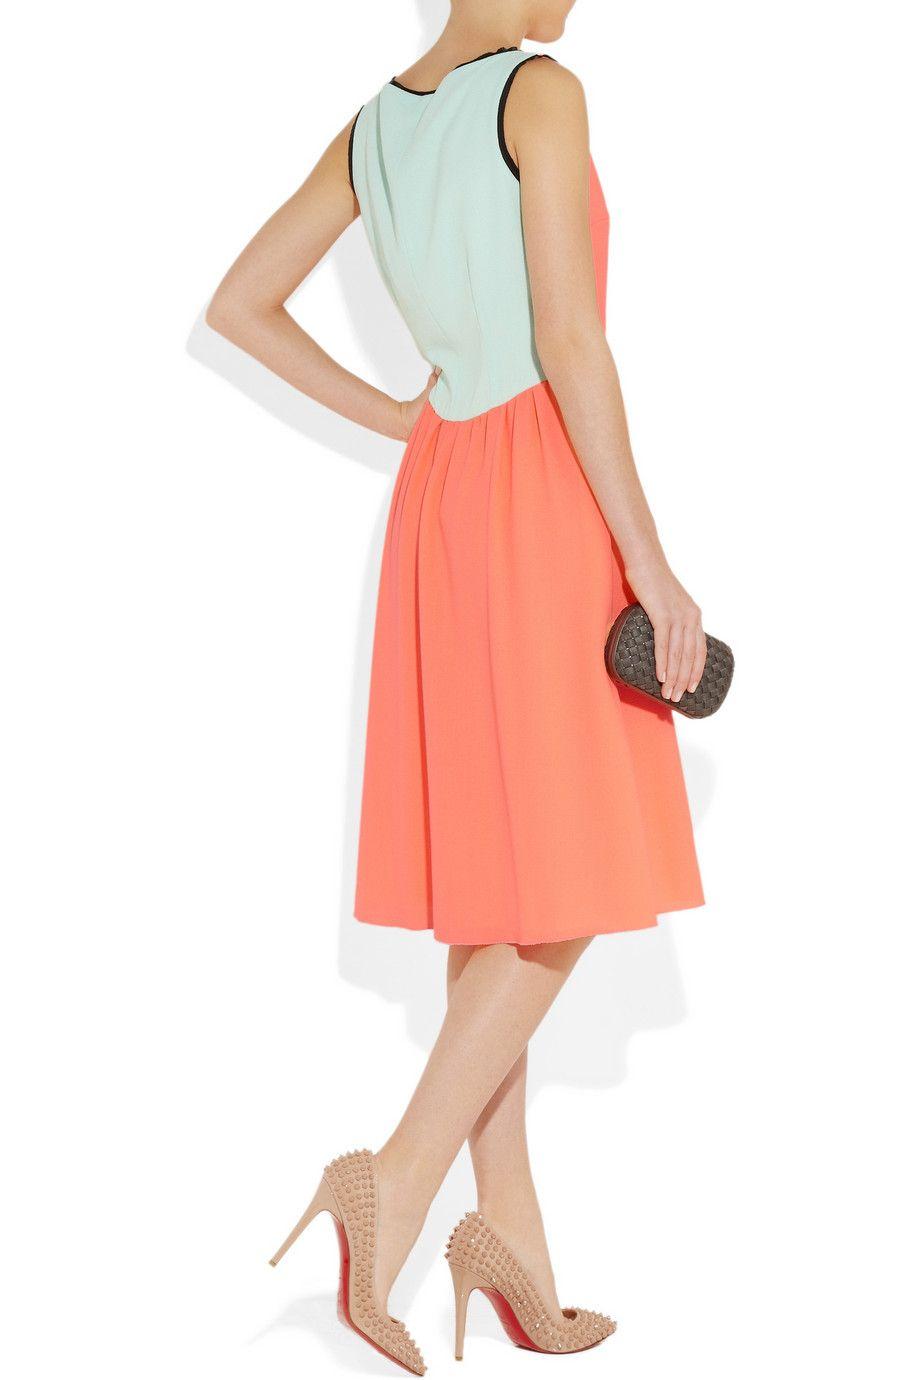 Roksanda Woman Layered Two-tone Crepe De Chine Mini Dress Peach Size 10 Roksanda Ilincic c4p2ft